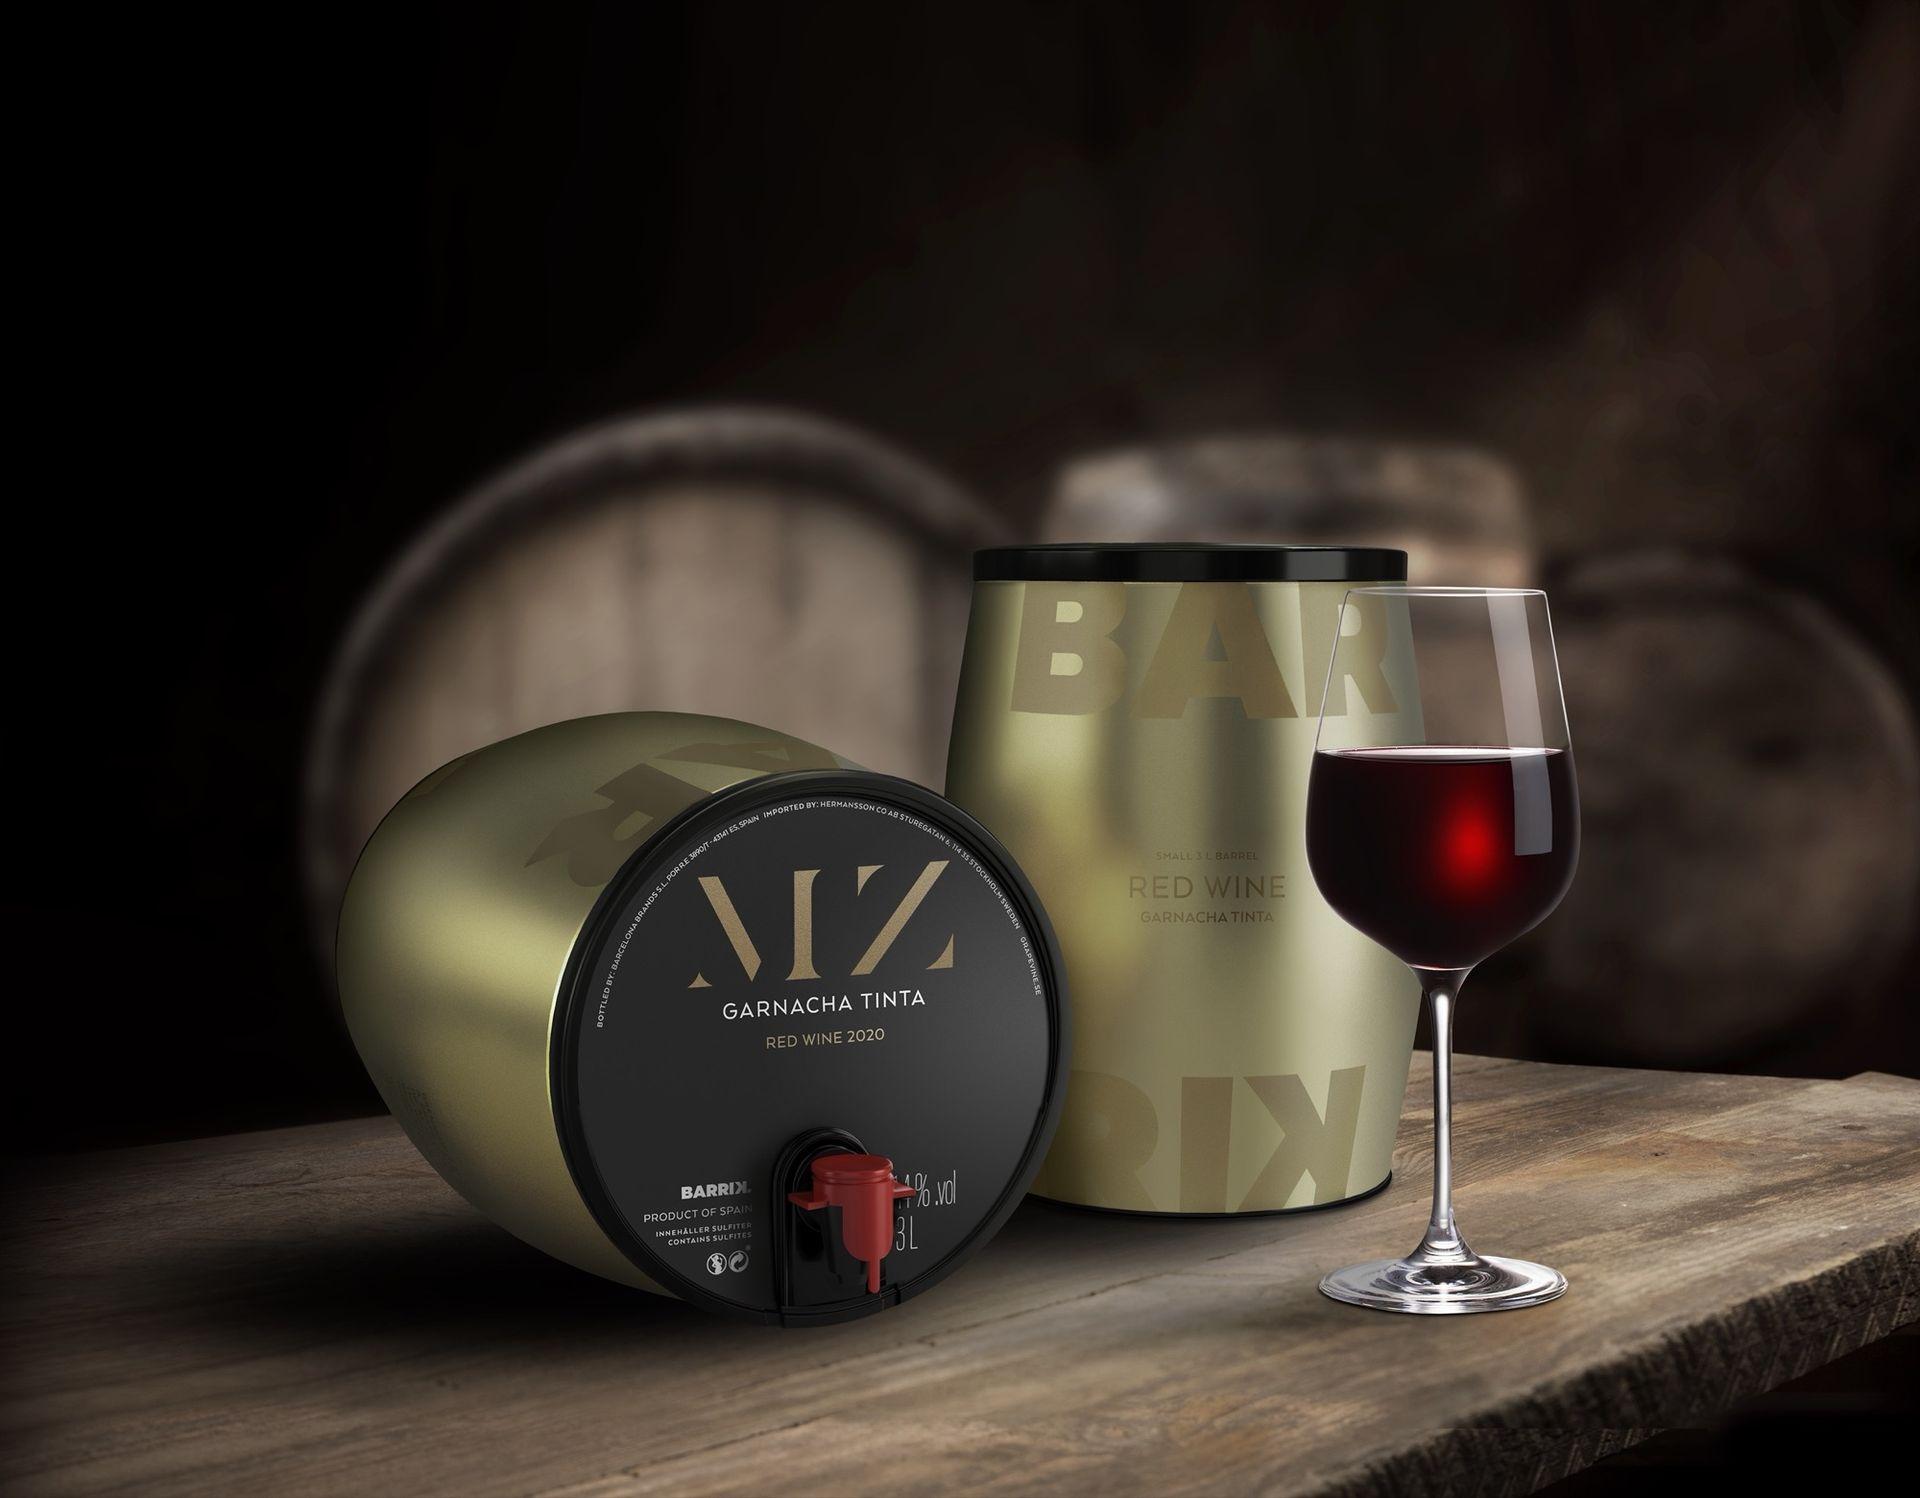 MZ Barrik - nytt rödvin från Måns Zelmerlöw